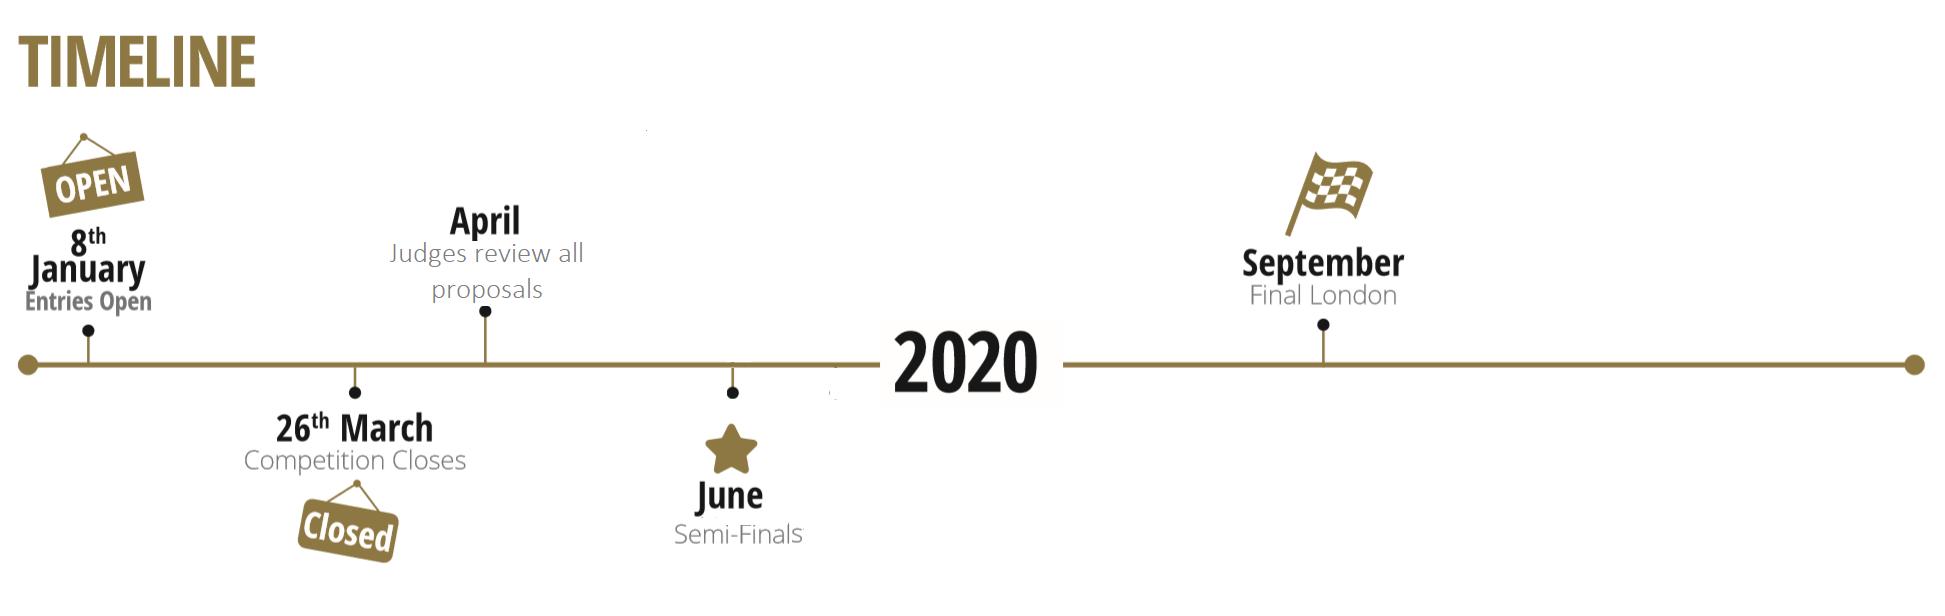 Young Banker timeline 2020